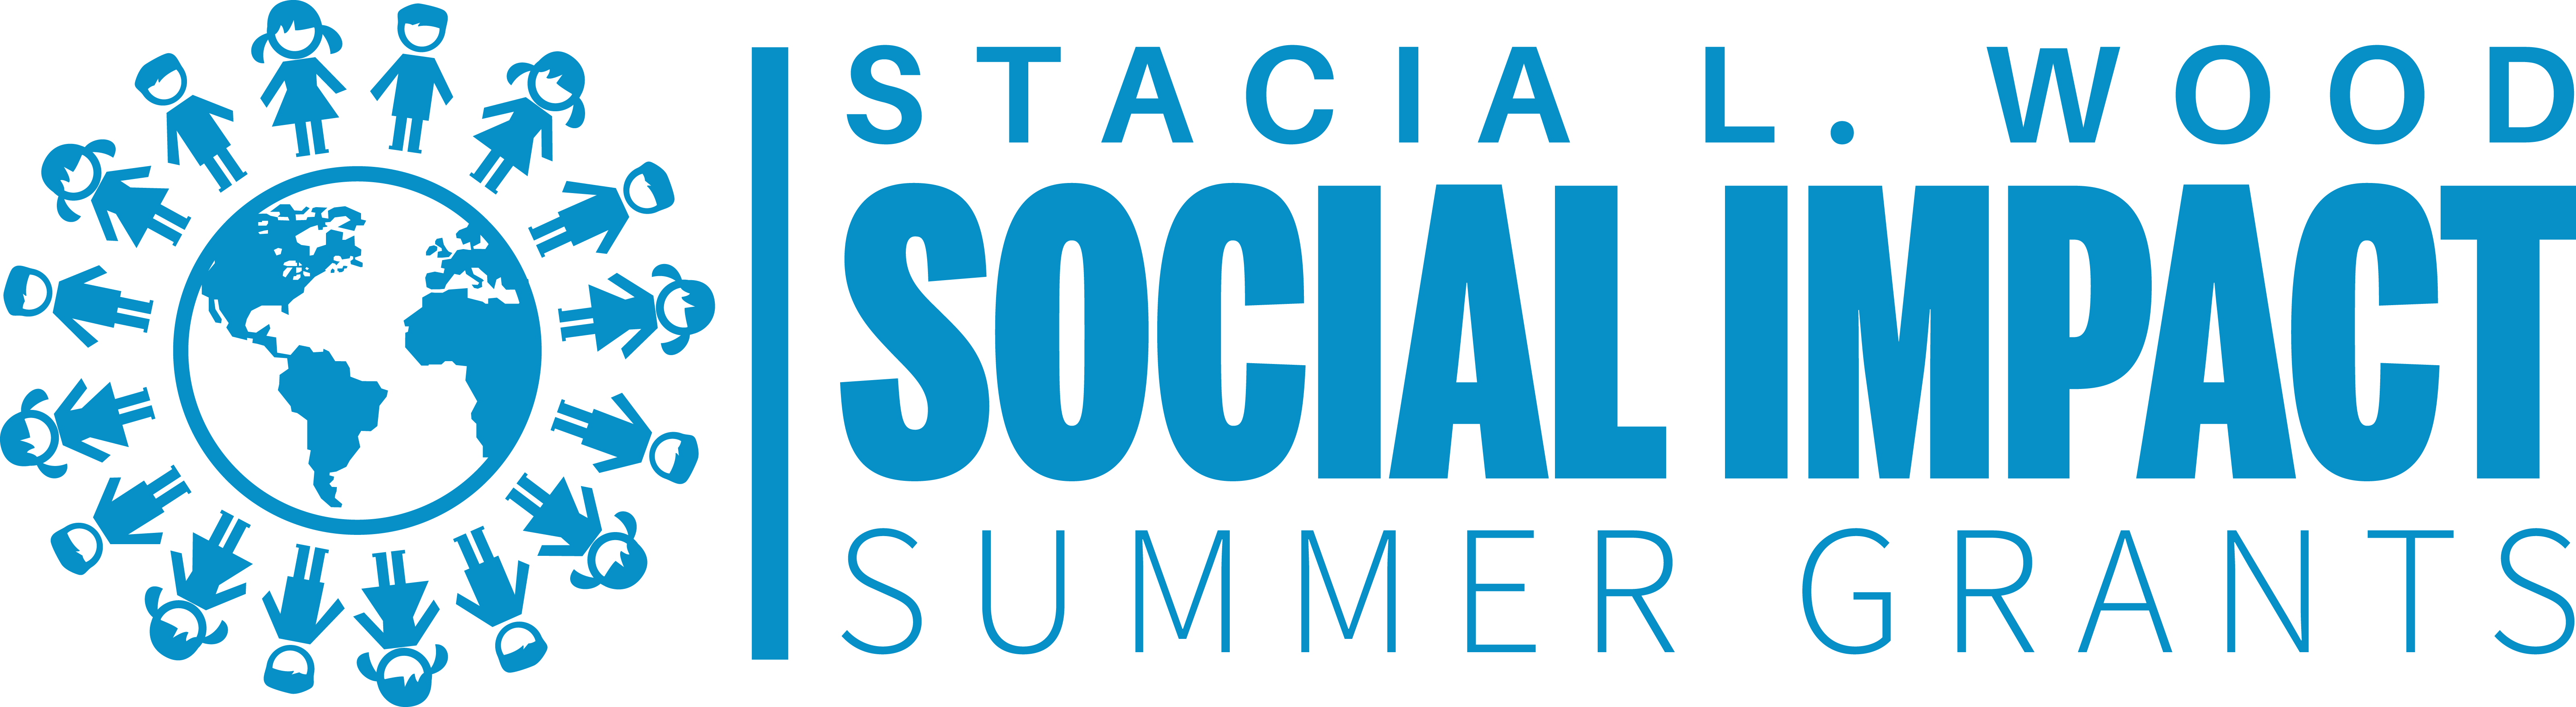 Social Impact Summer Grants (SISG)